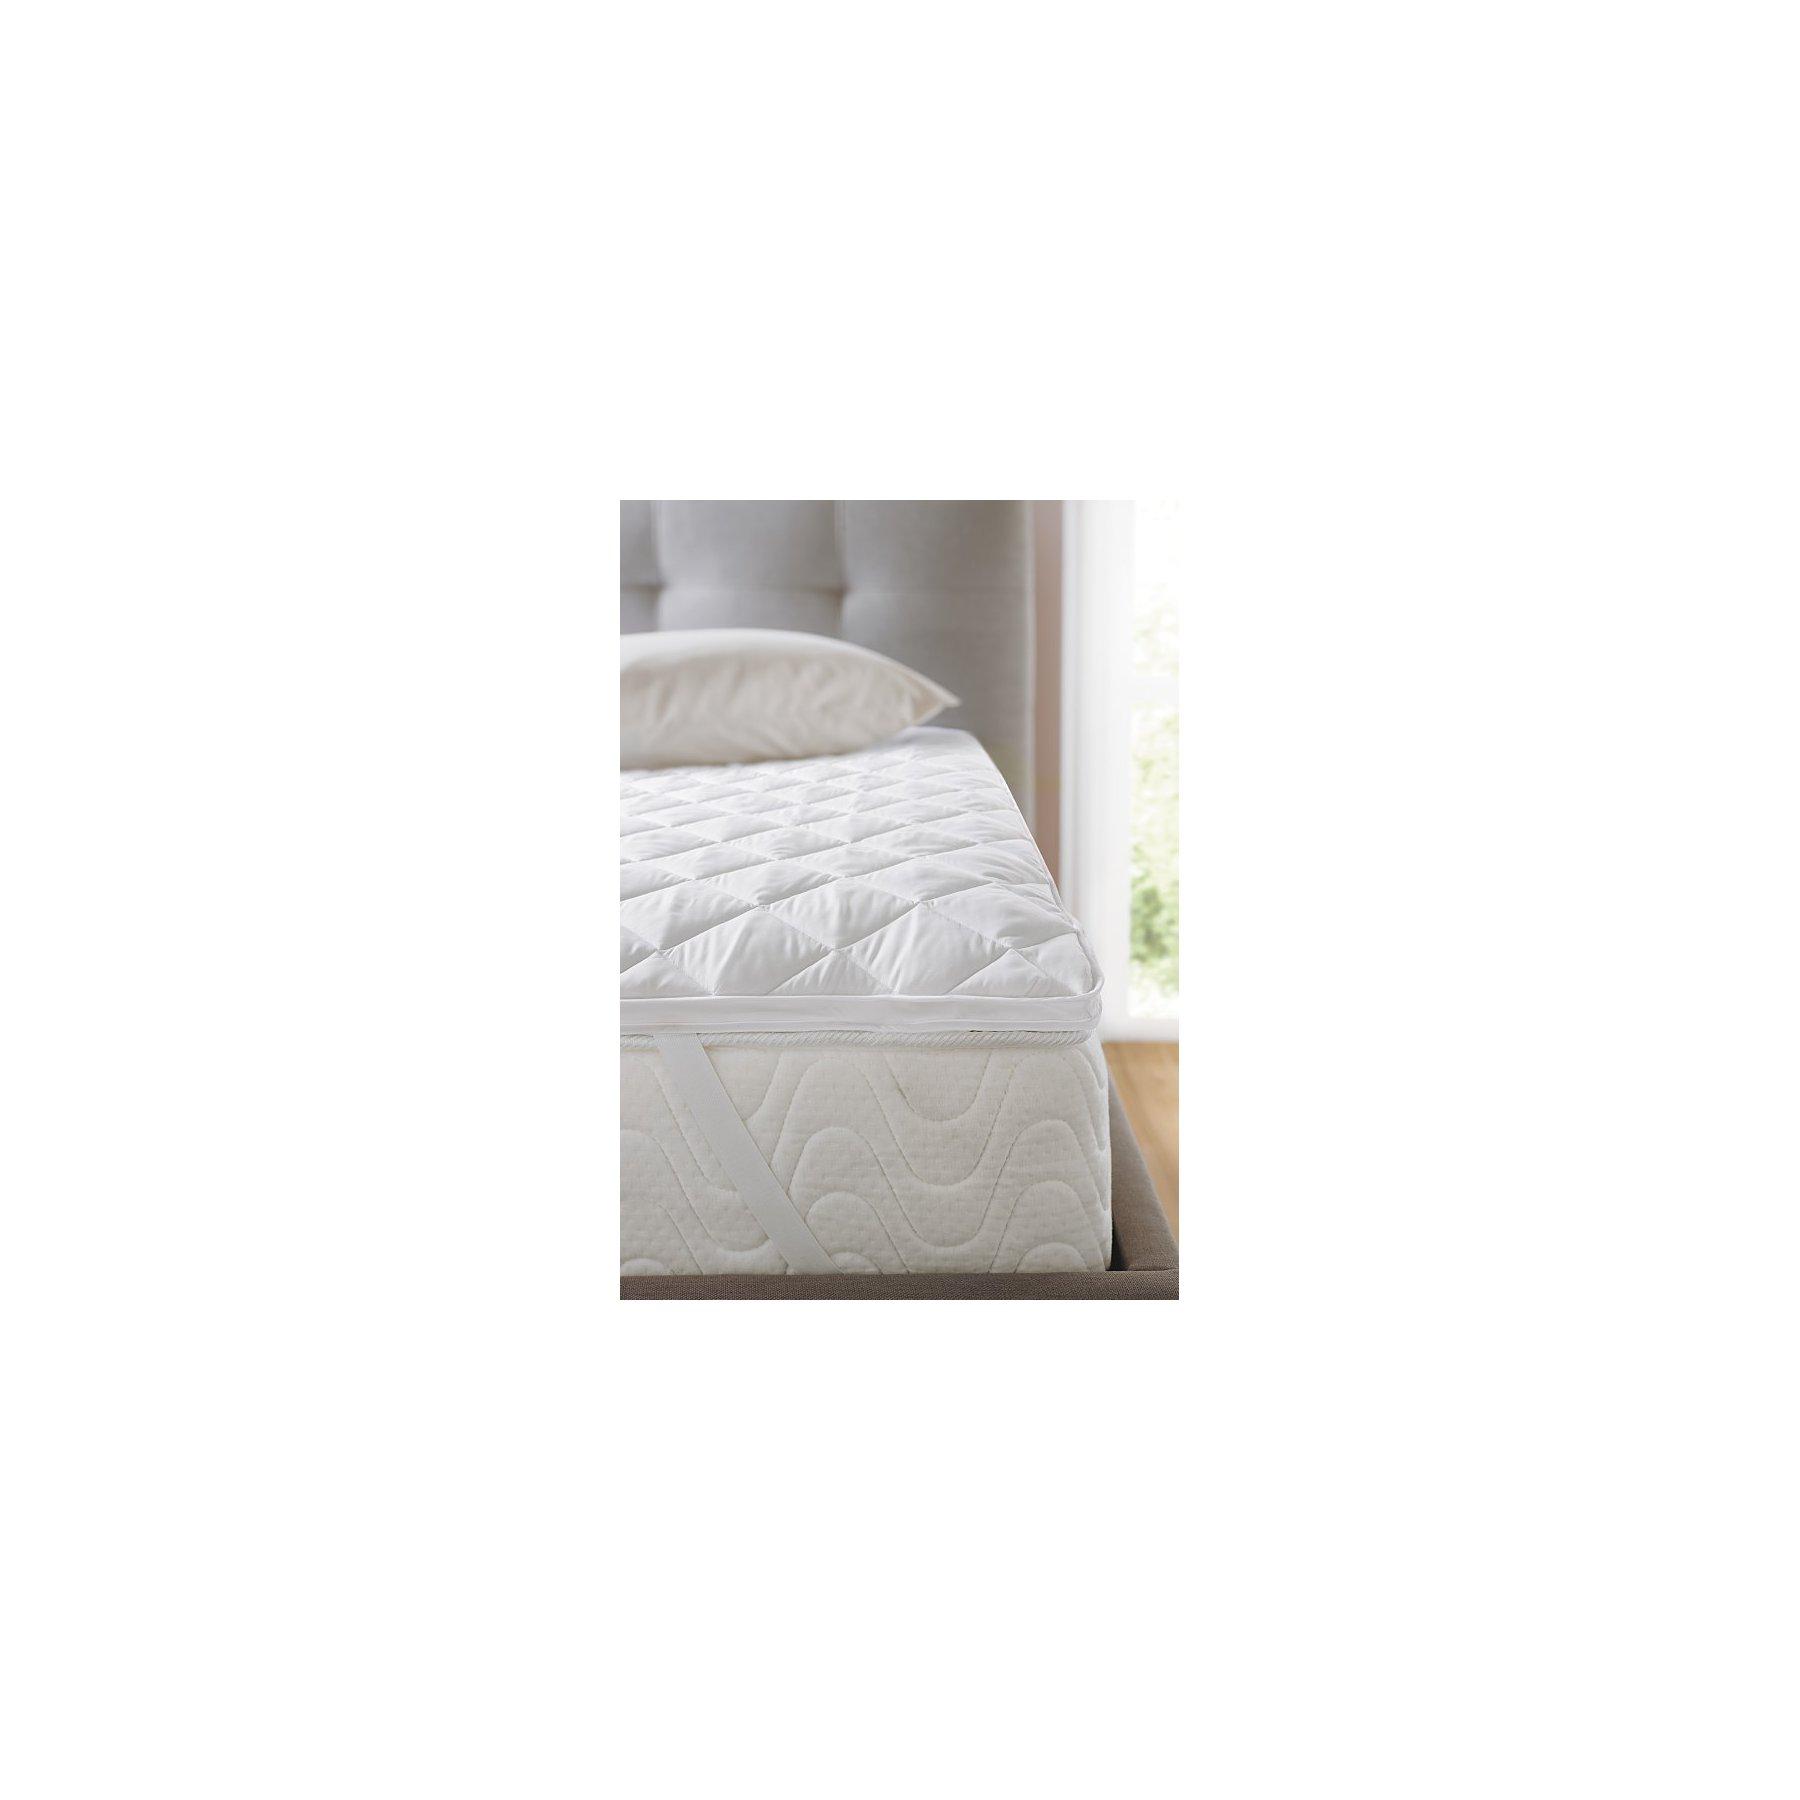 Dual Layer Mattress Topper Duvets Pillows George At Asda